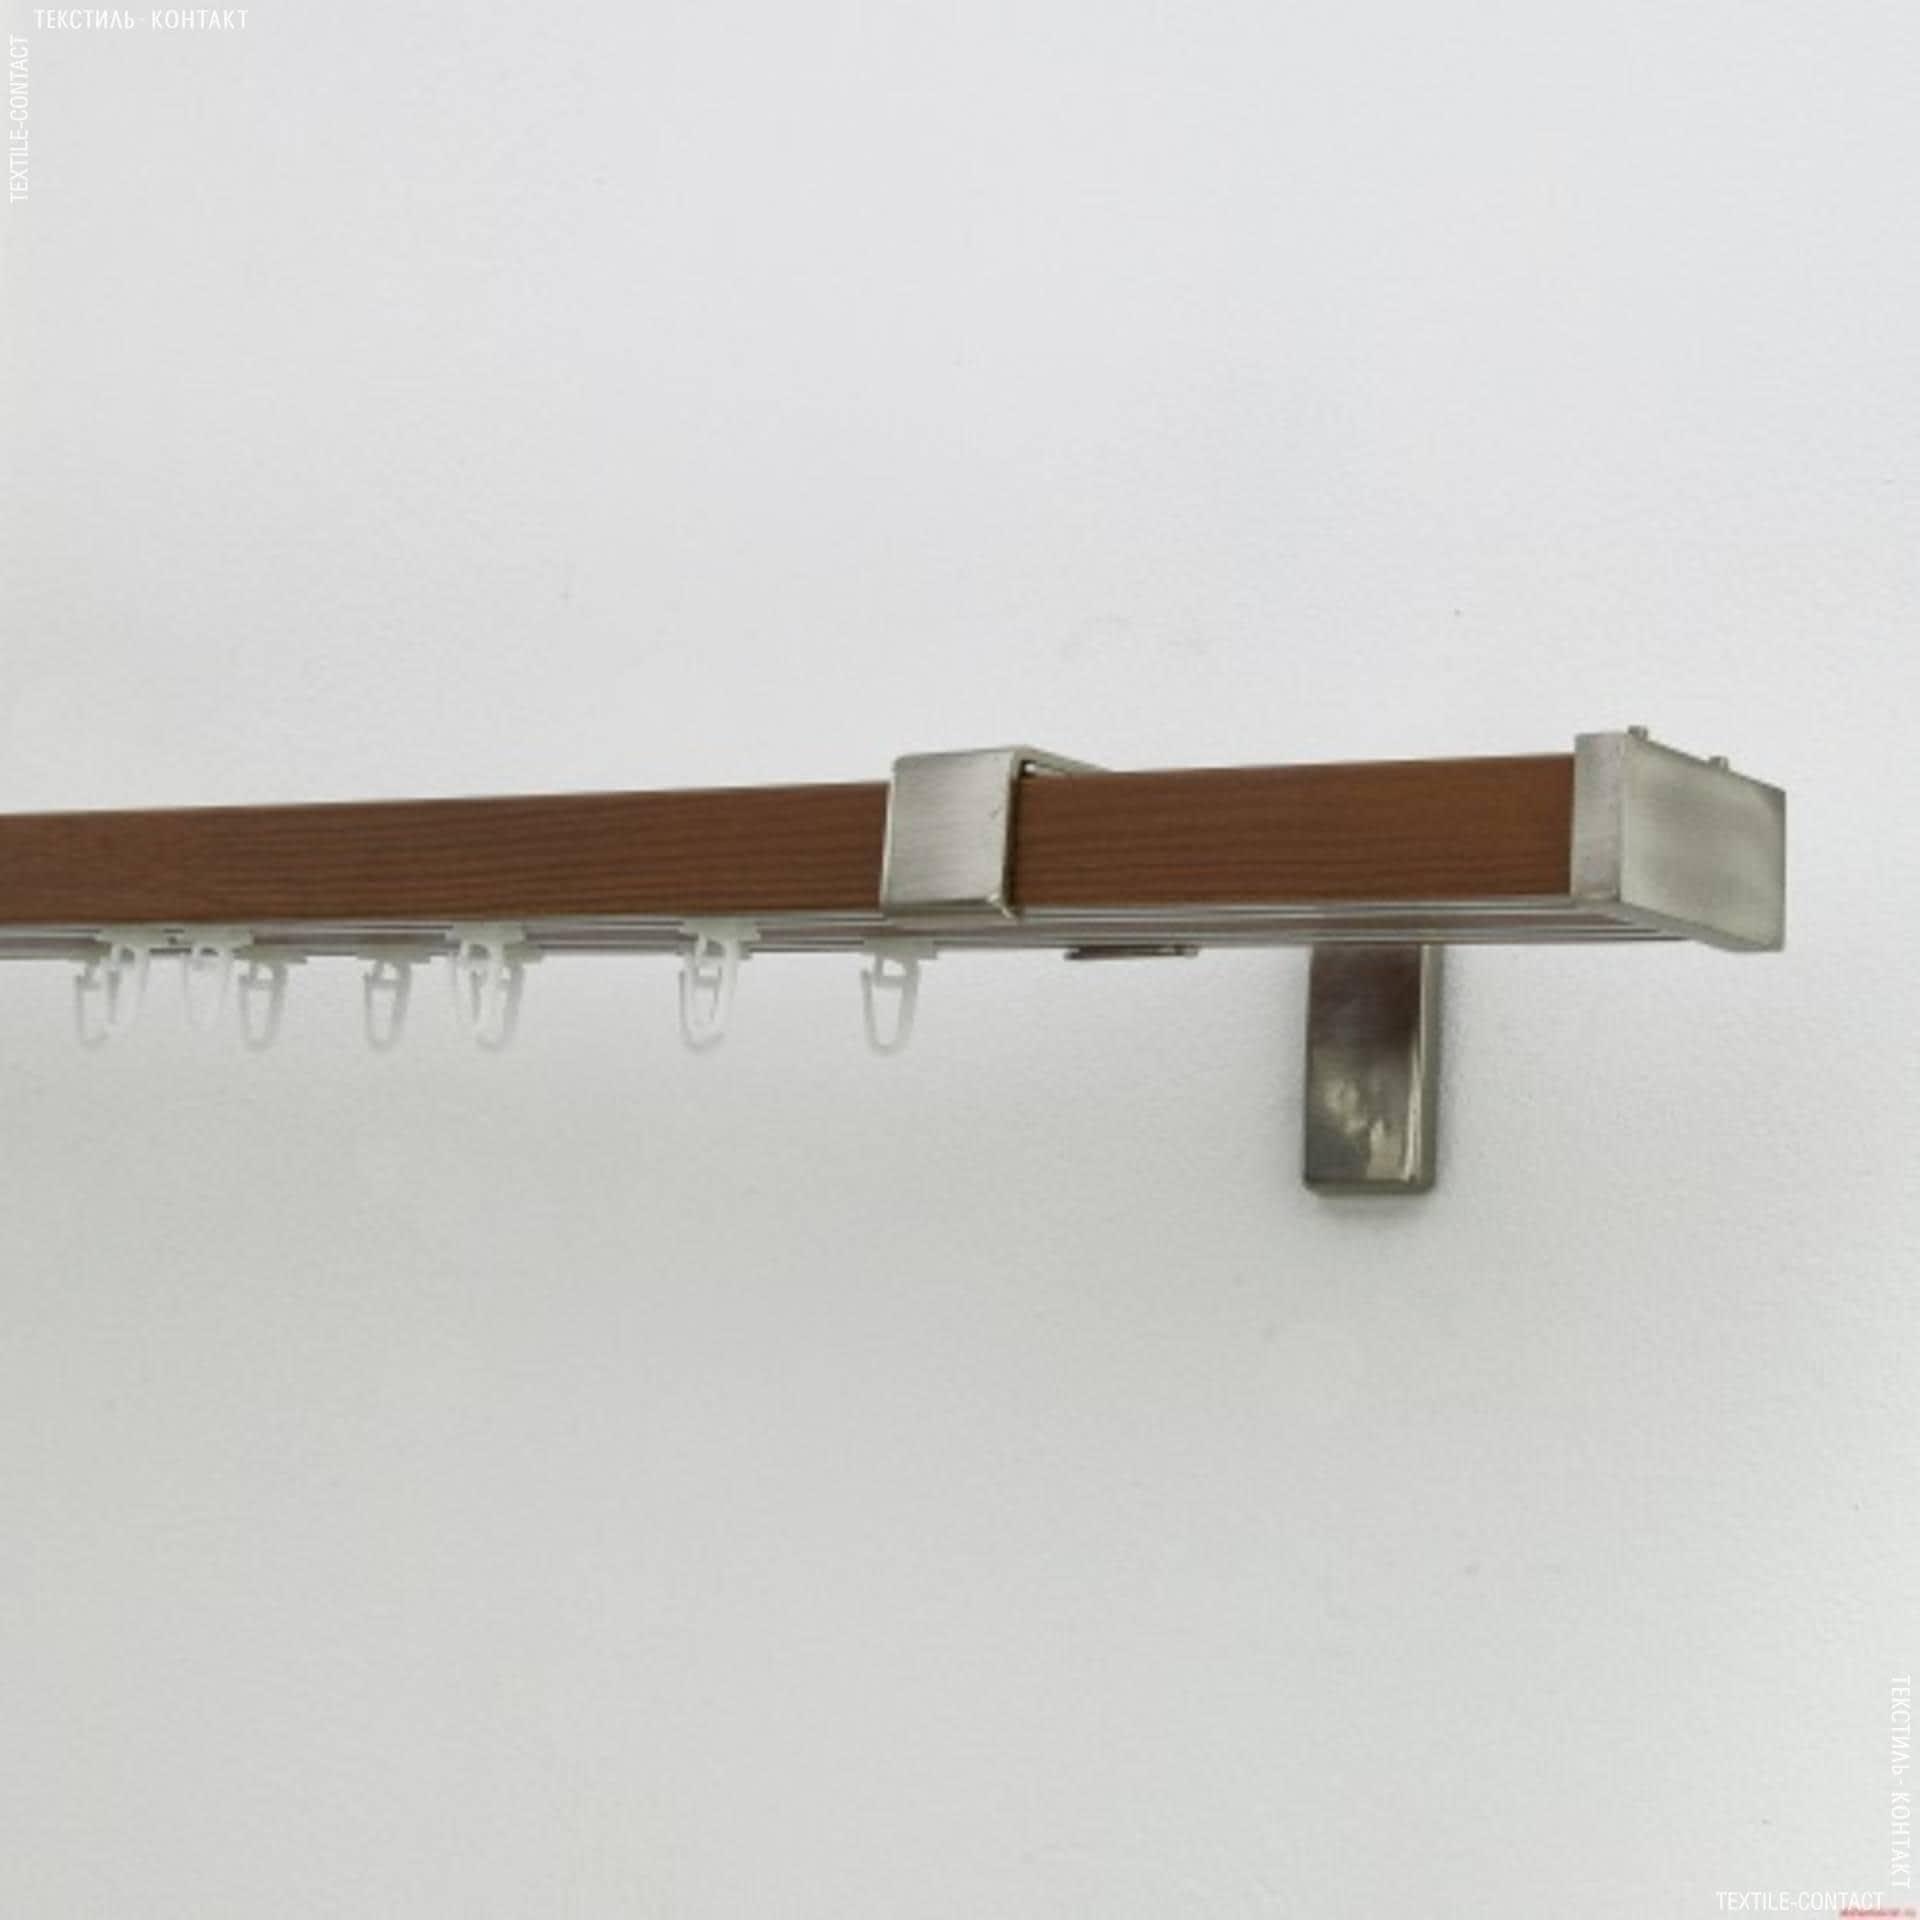 Тканини карнизи - КАРНИЗ КВАДРАТО на 2 ряди СТАЛЬ+ЧЕРЕШНЯ 25мм/160СМ